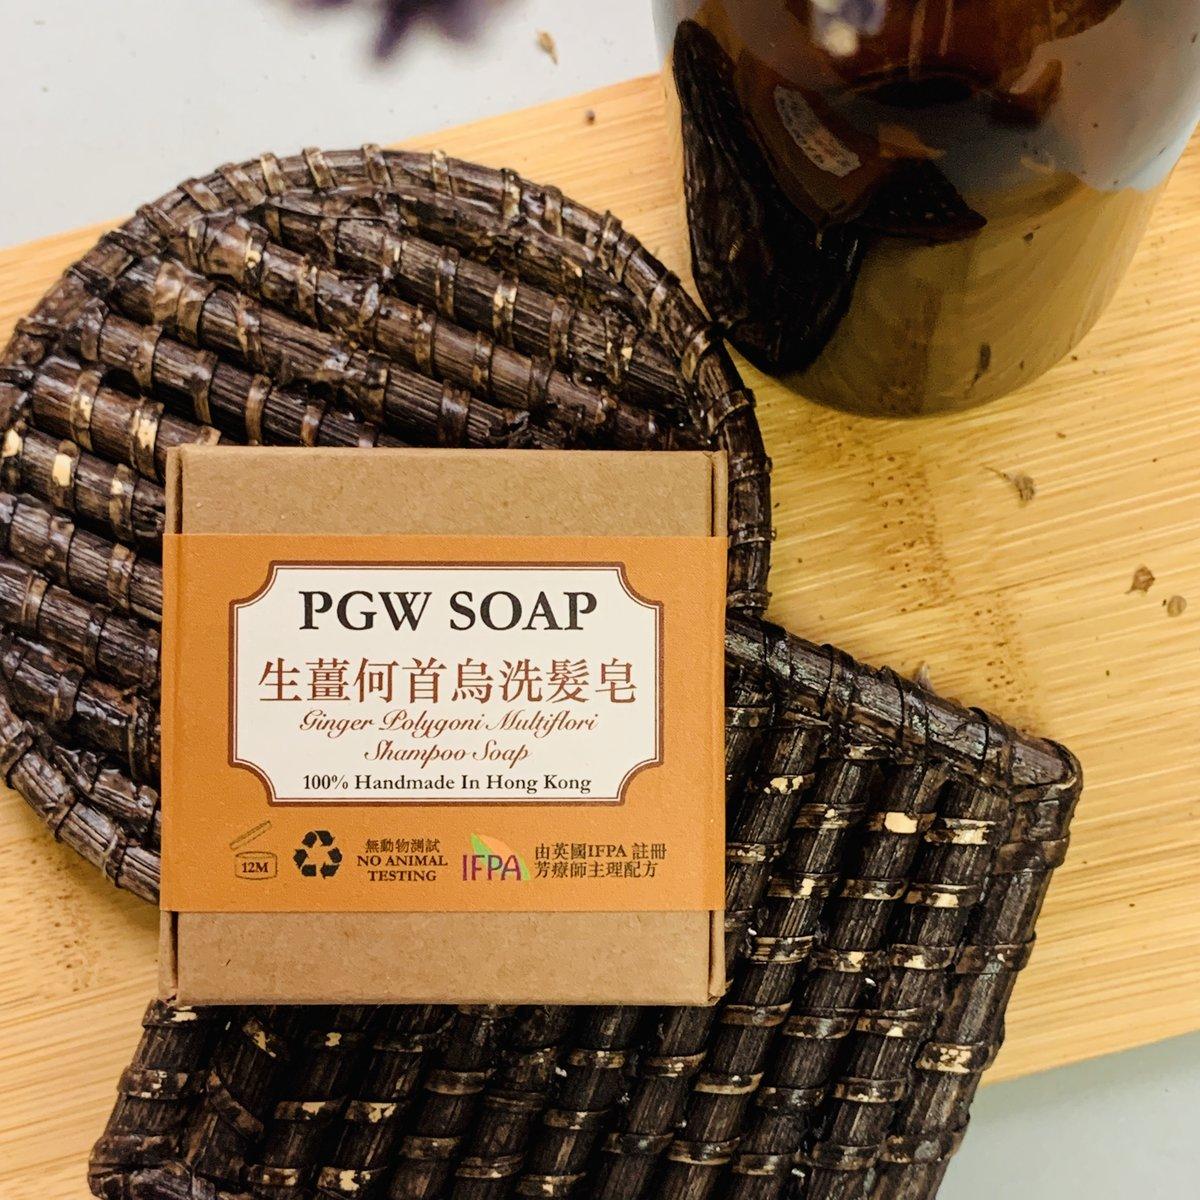 Ginger Polygoni Multiflori Shampoo Soap 30g(Mini Size)